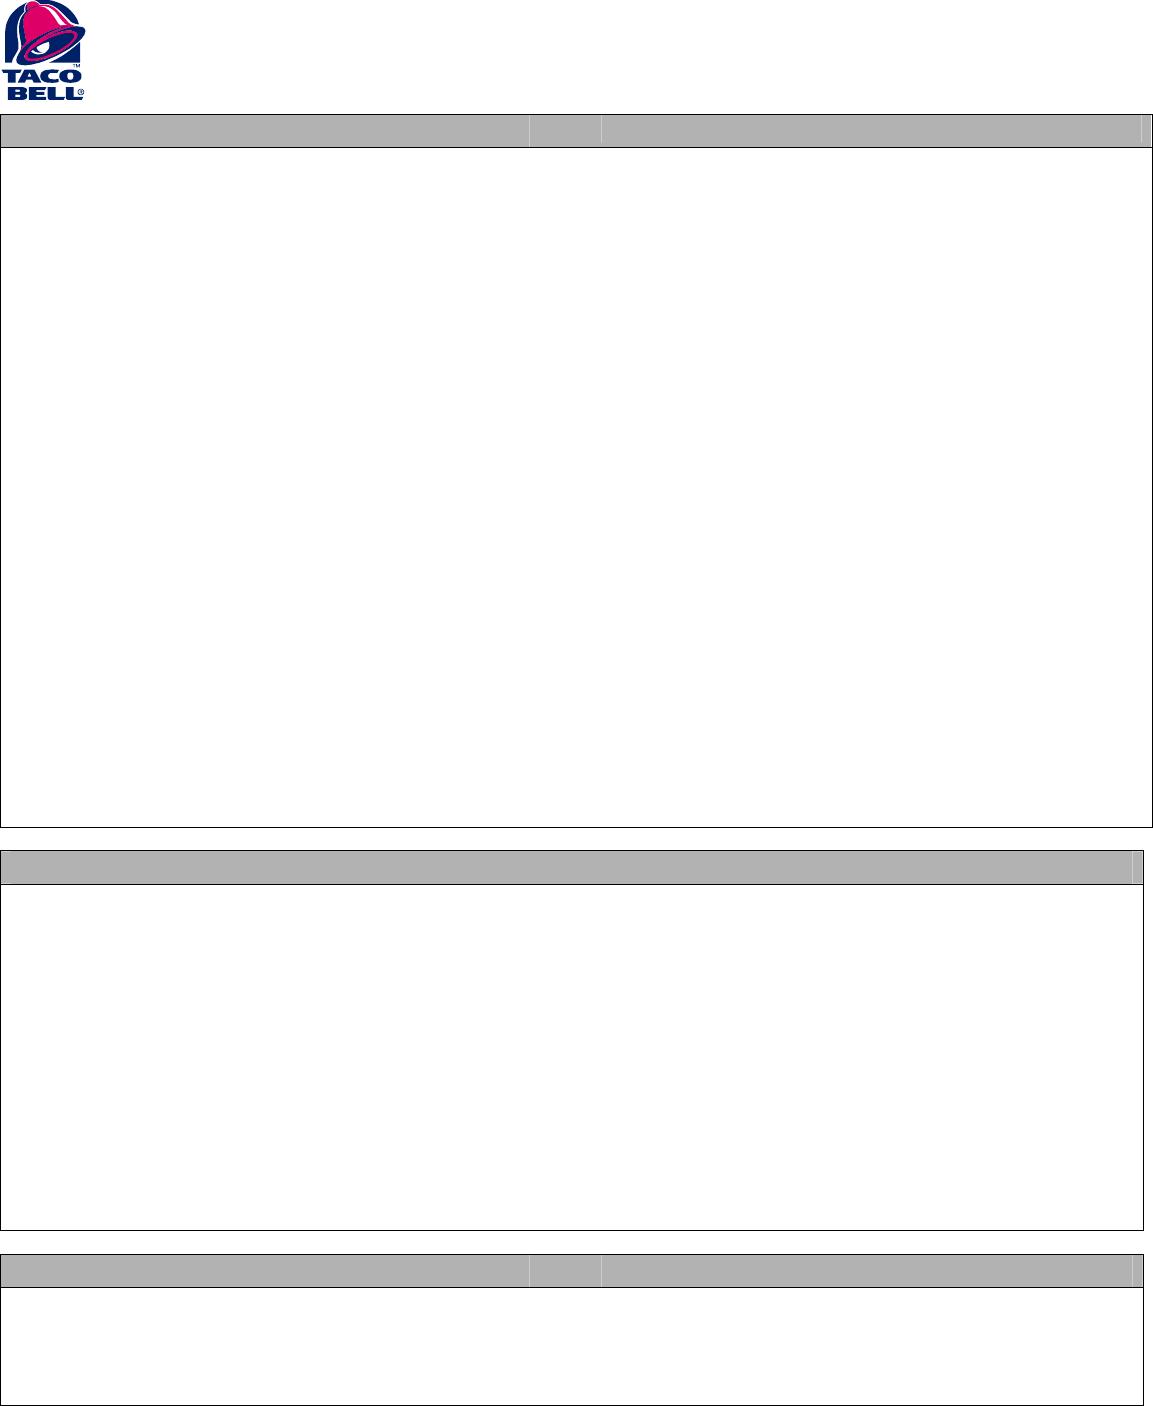 Free Printable Taco Bell Job Application Form - Free Printable Taco Bell Application